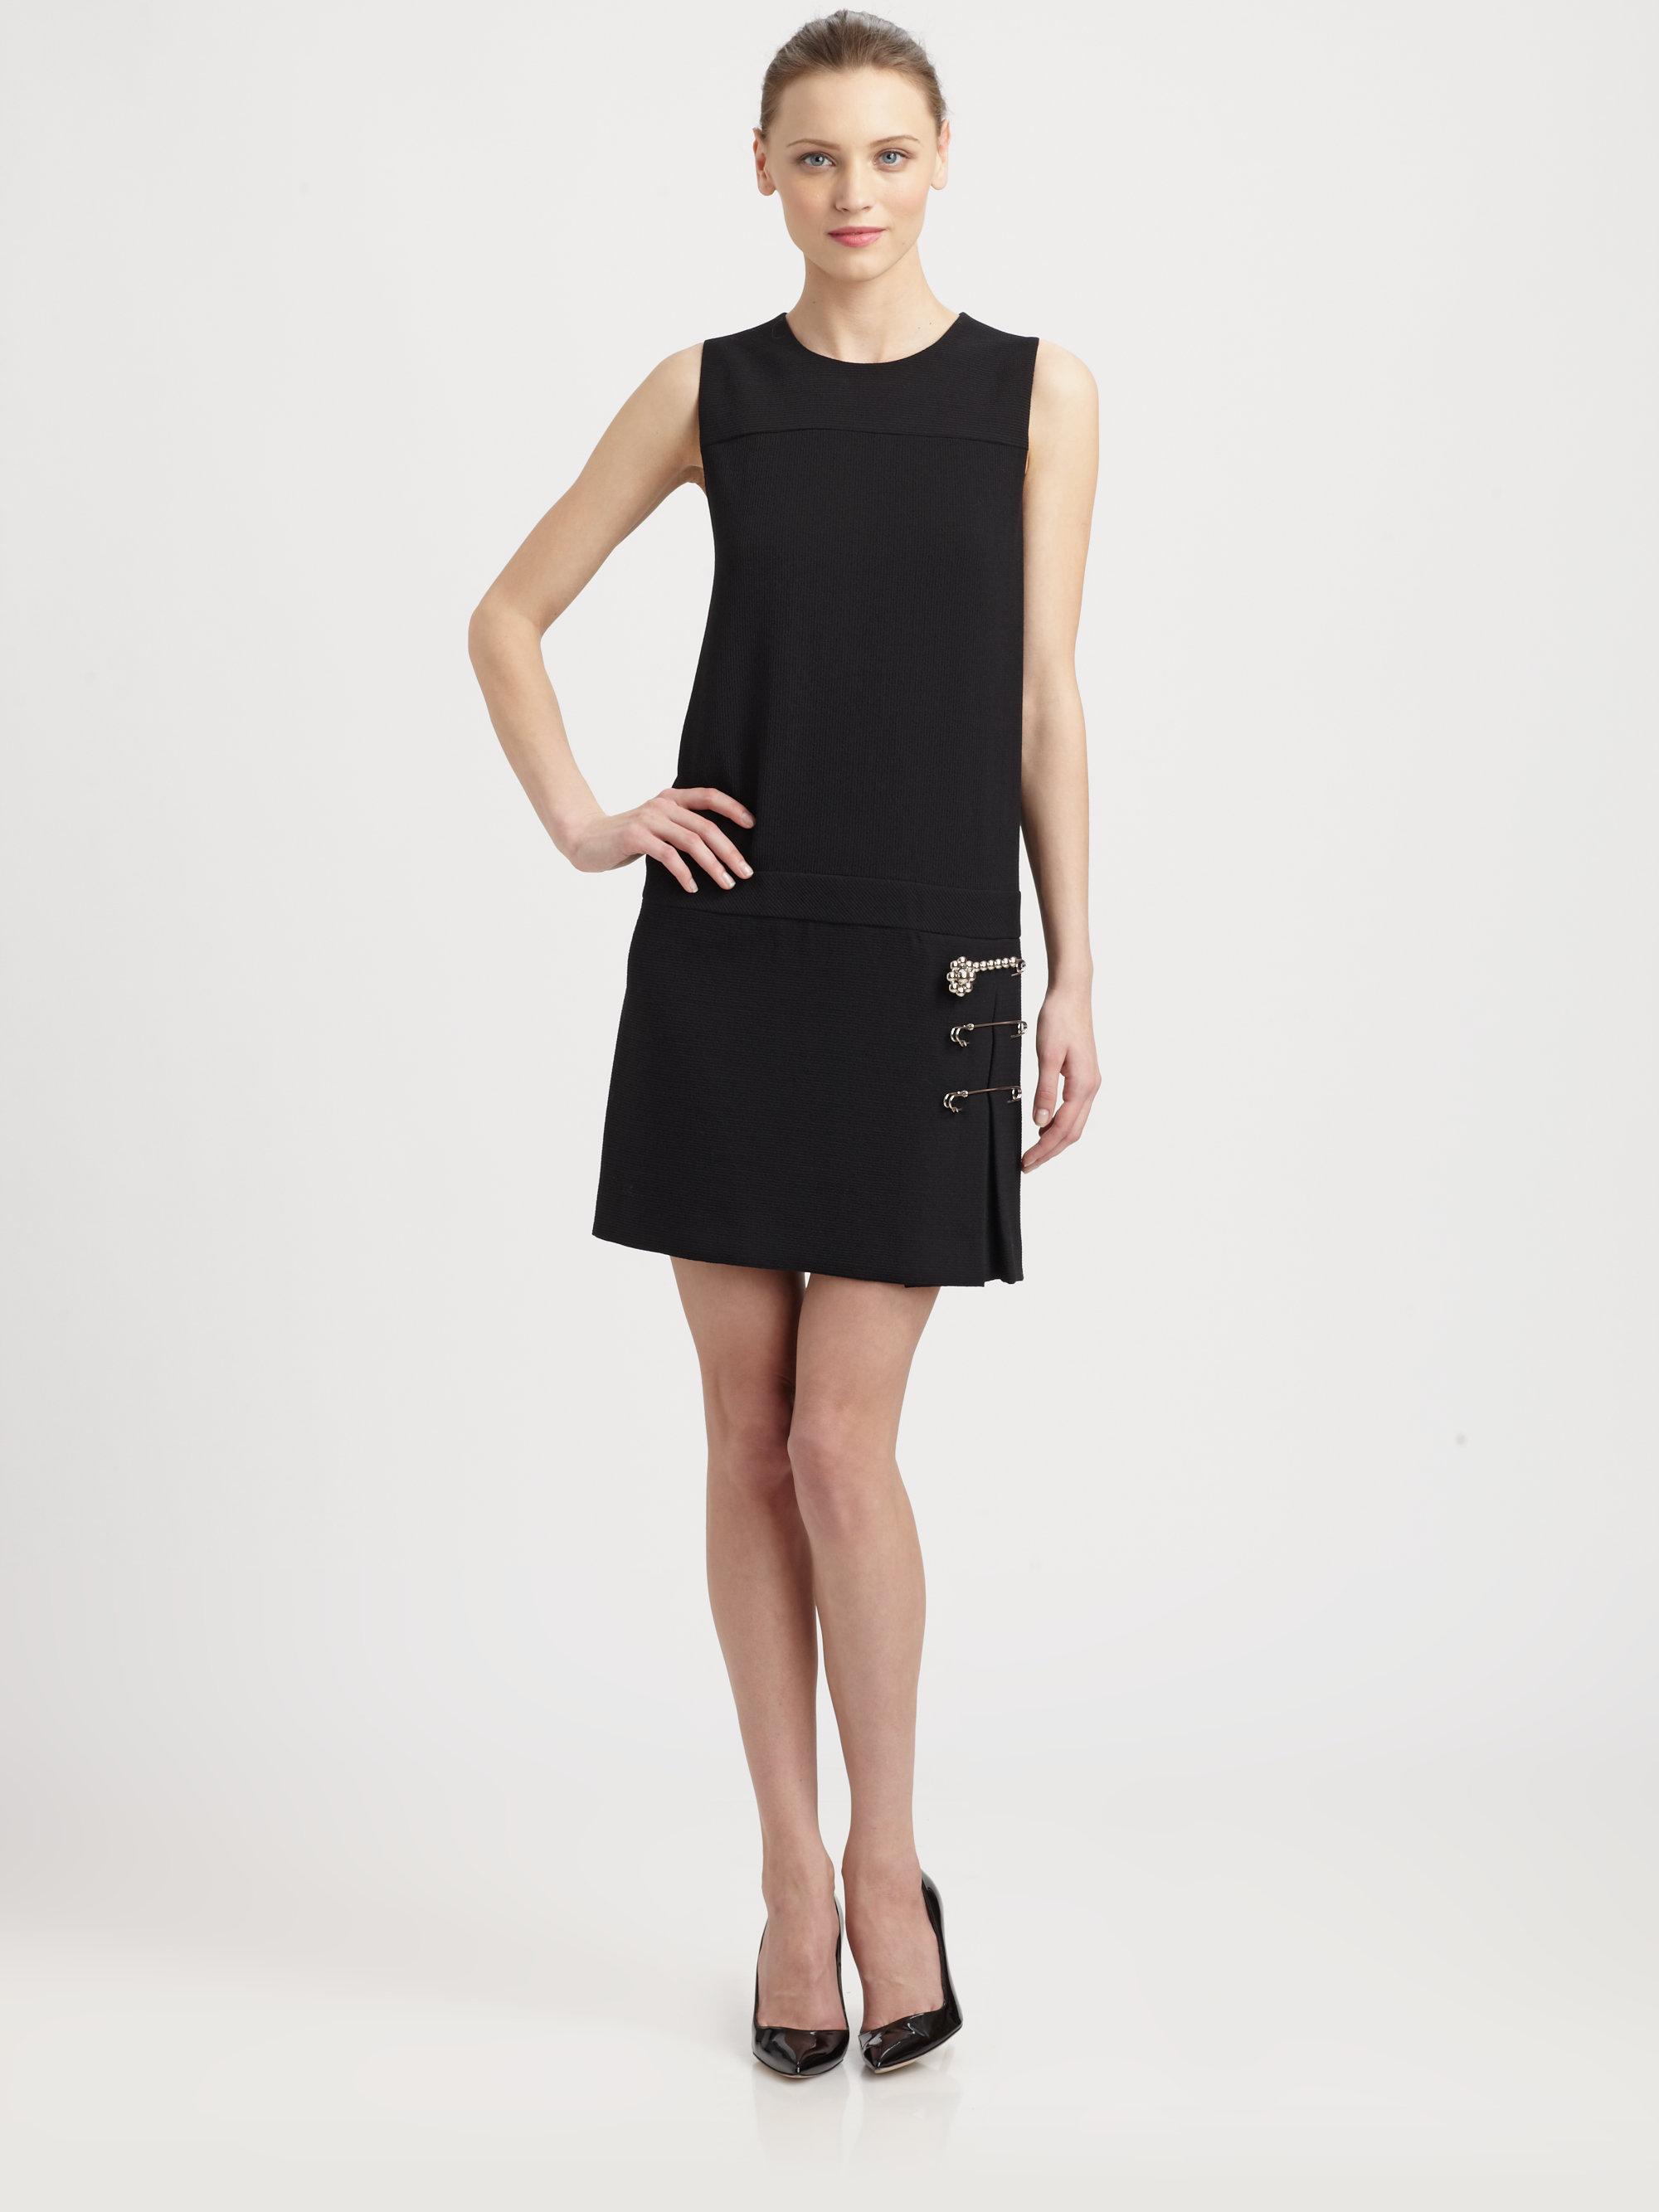 Moschino Cheap Chic Ottoman Dress In Black Lyst